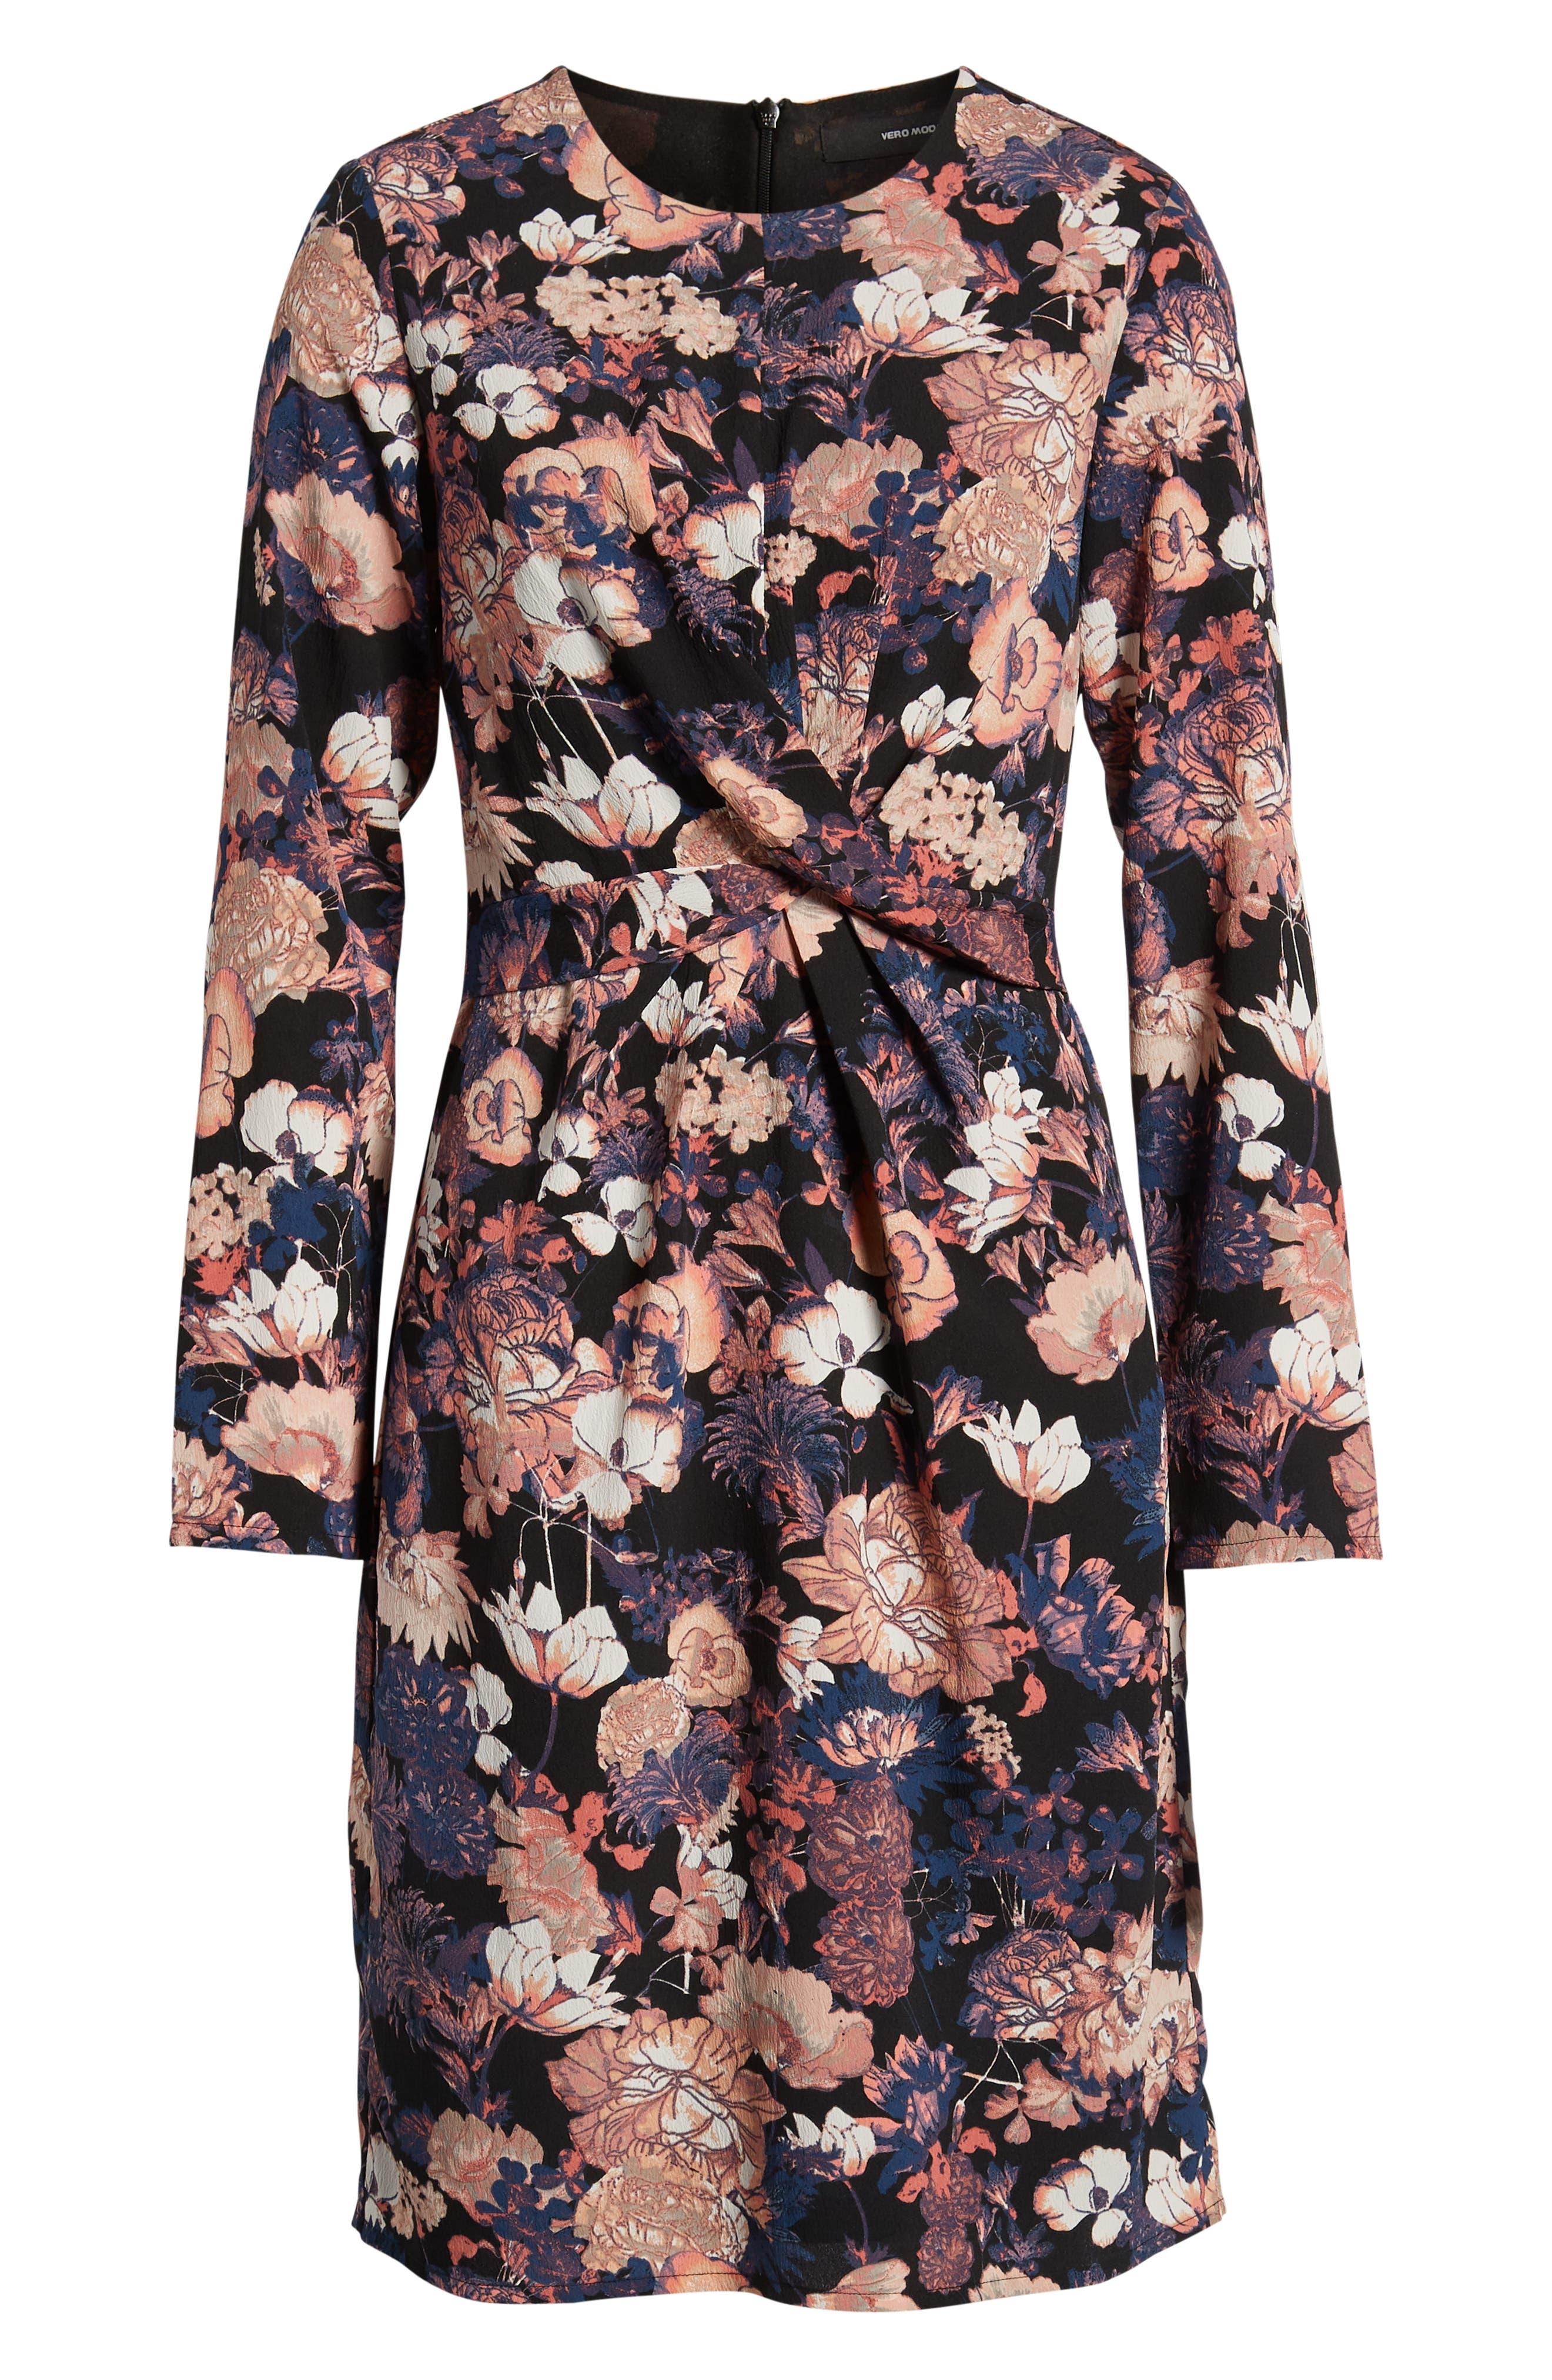 VERO MODA,                             Marlene Floral Drape Dress,                             Alternate thumbnail 7, color,                             BLACK PRINT